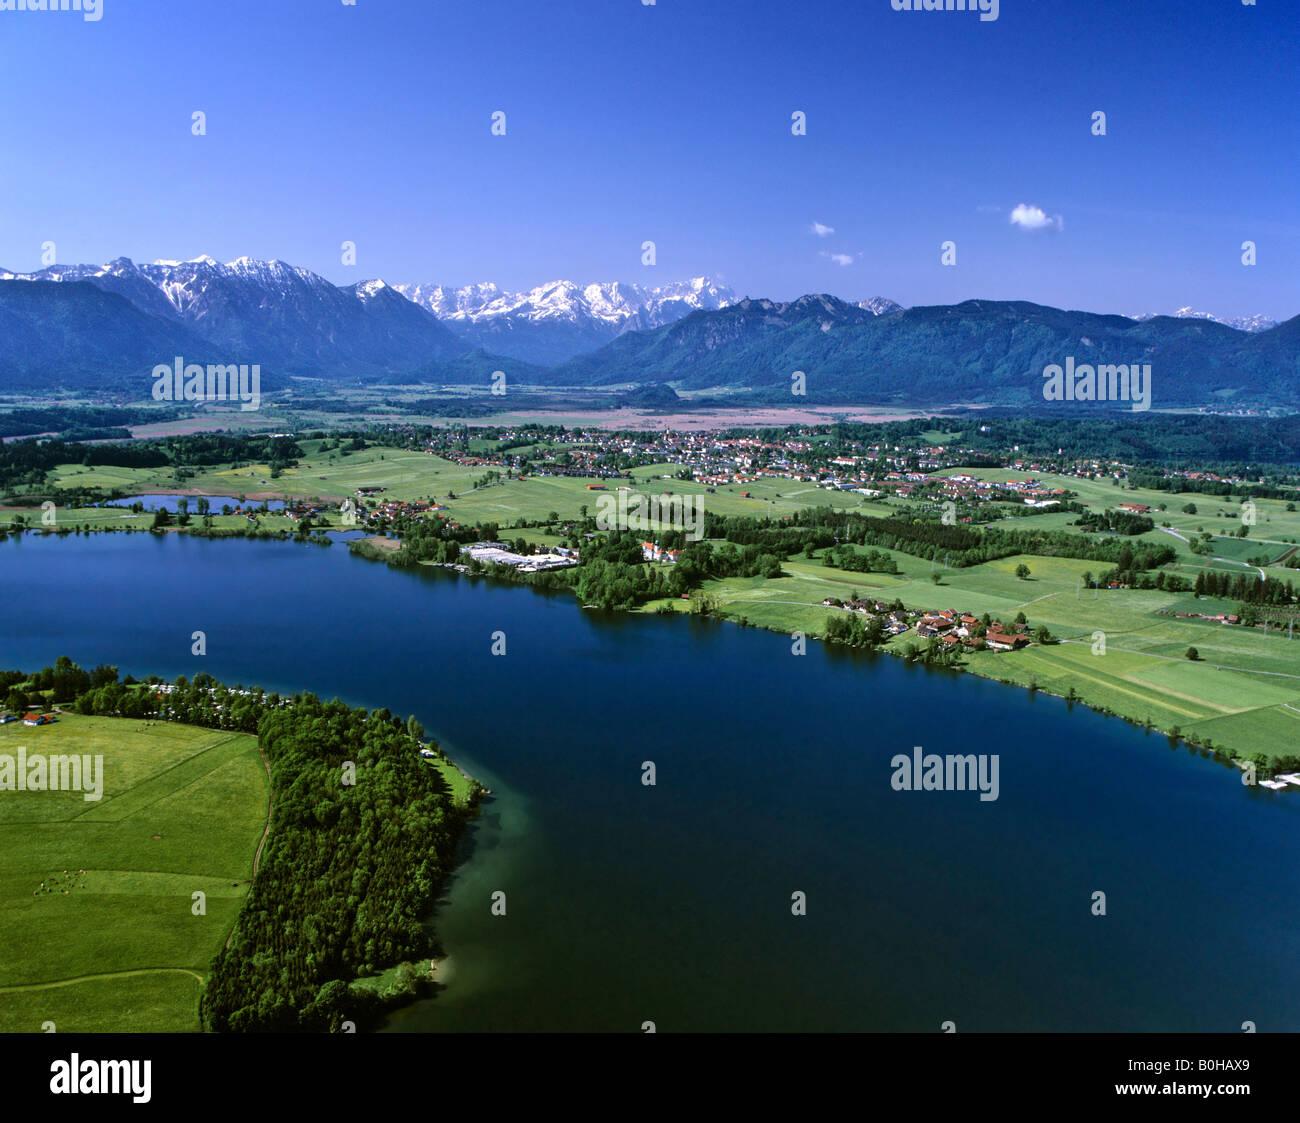 Lake Riegsee, Murnau, Loisachtal Valley, Wedenfelser Land region, Upper Bavaria, Bavaria, Germany - Stock Image